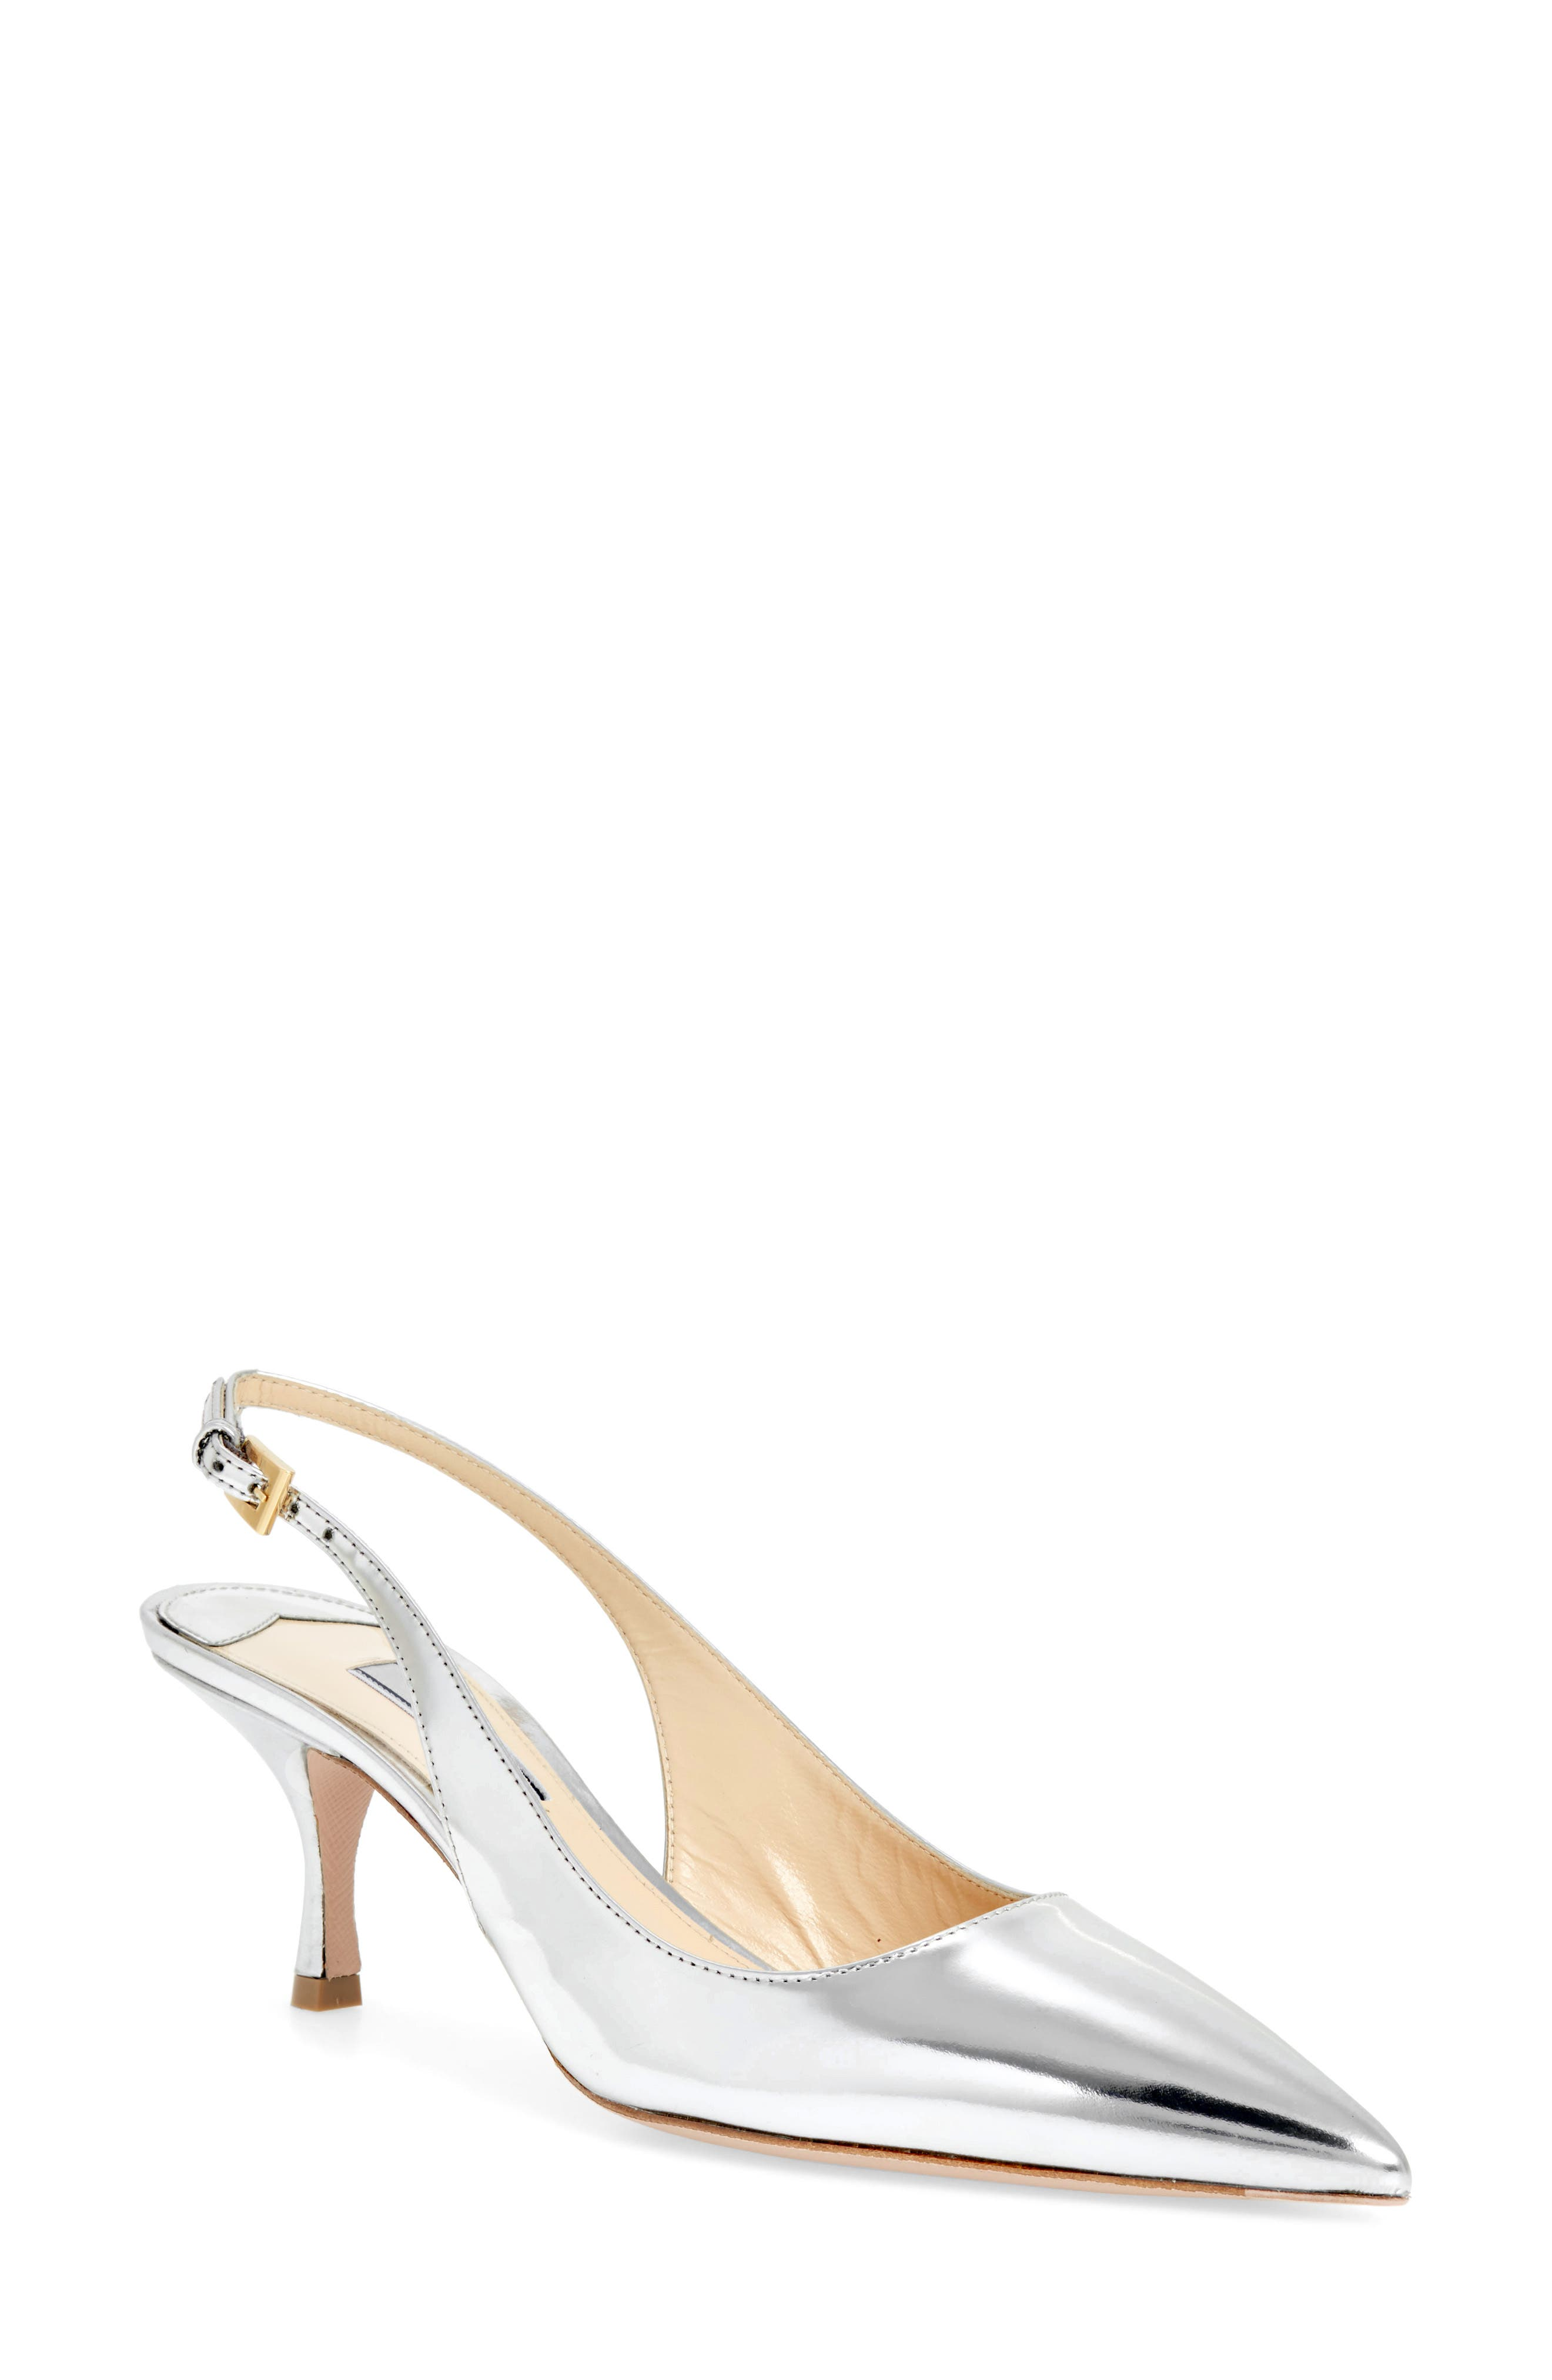 Alternate Image 1 Selected - Prada Pointy Toe Slingback Sandal (Women)